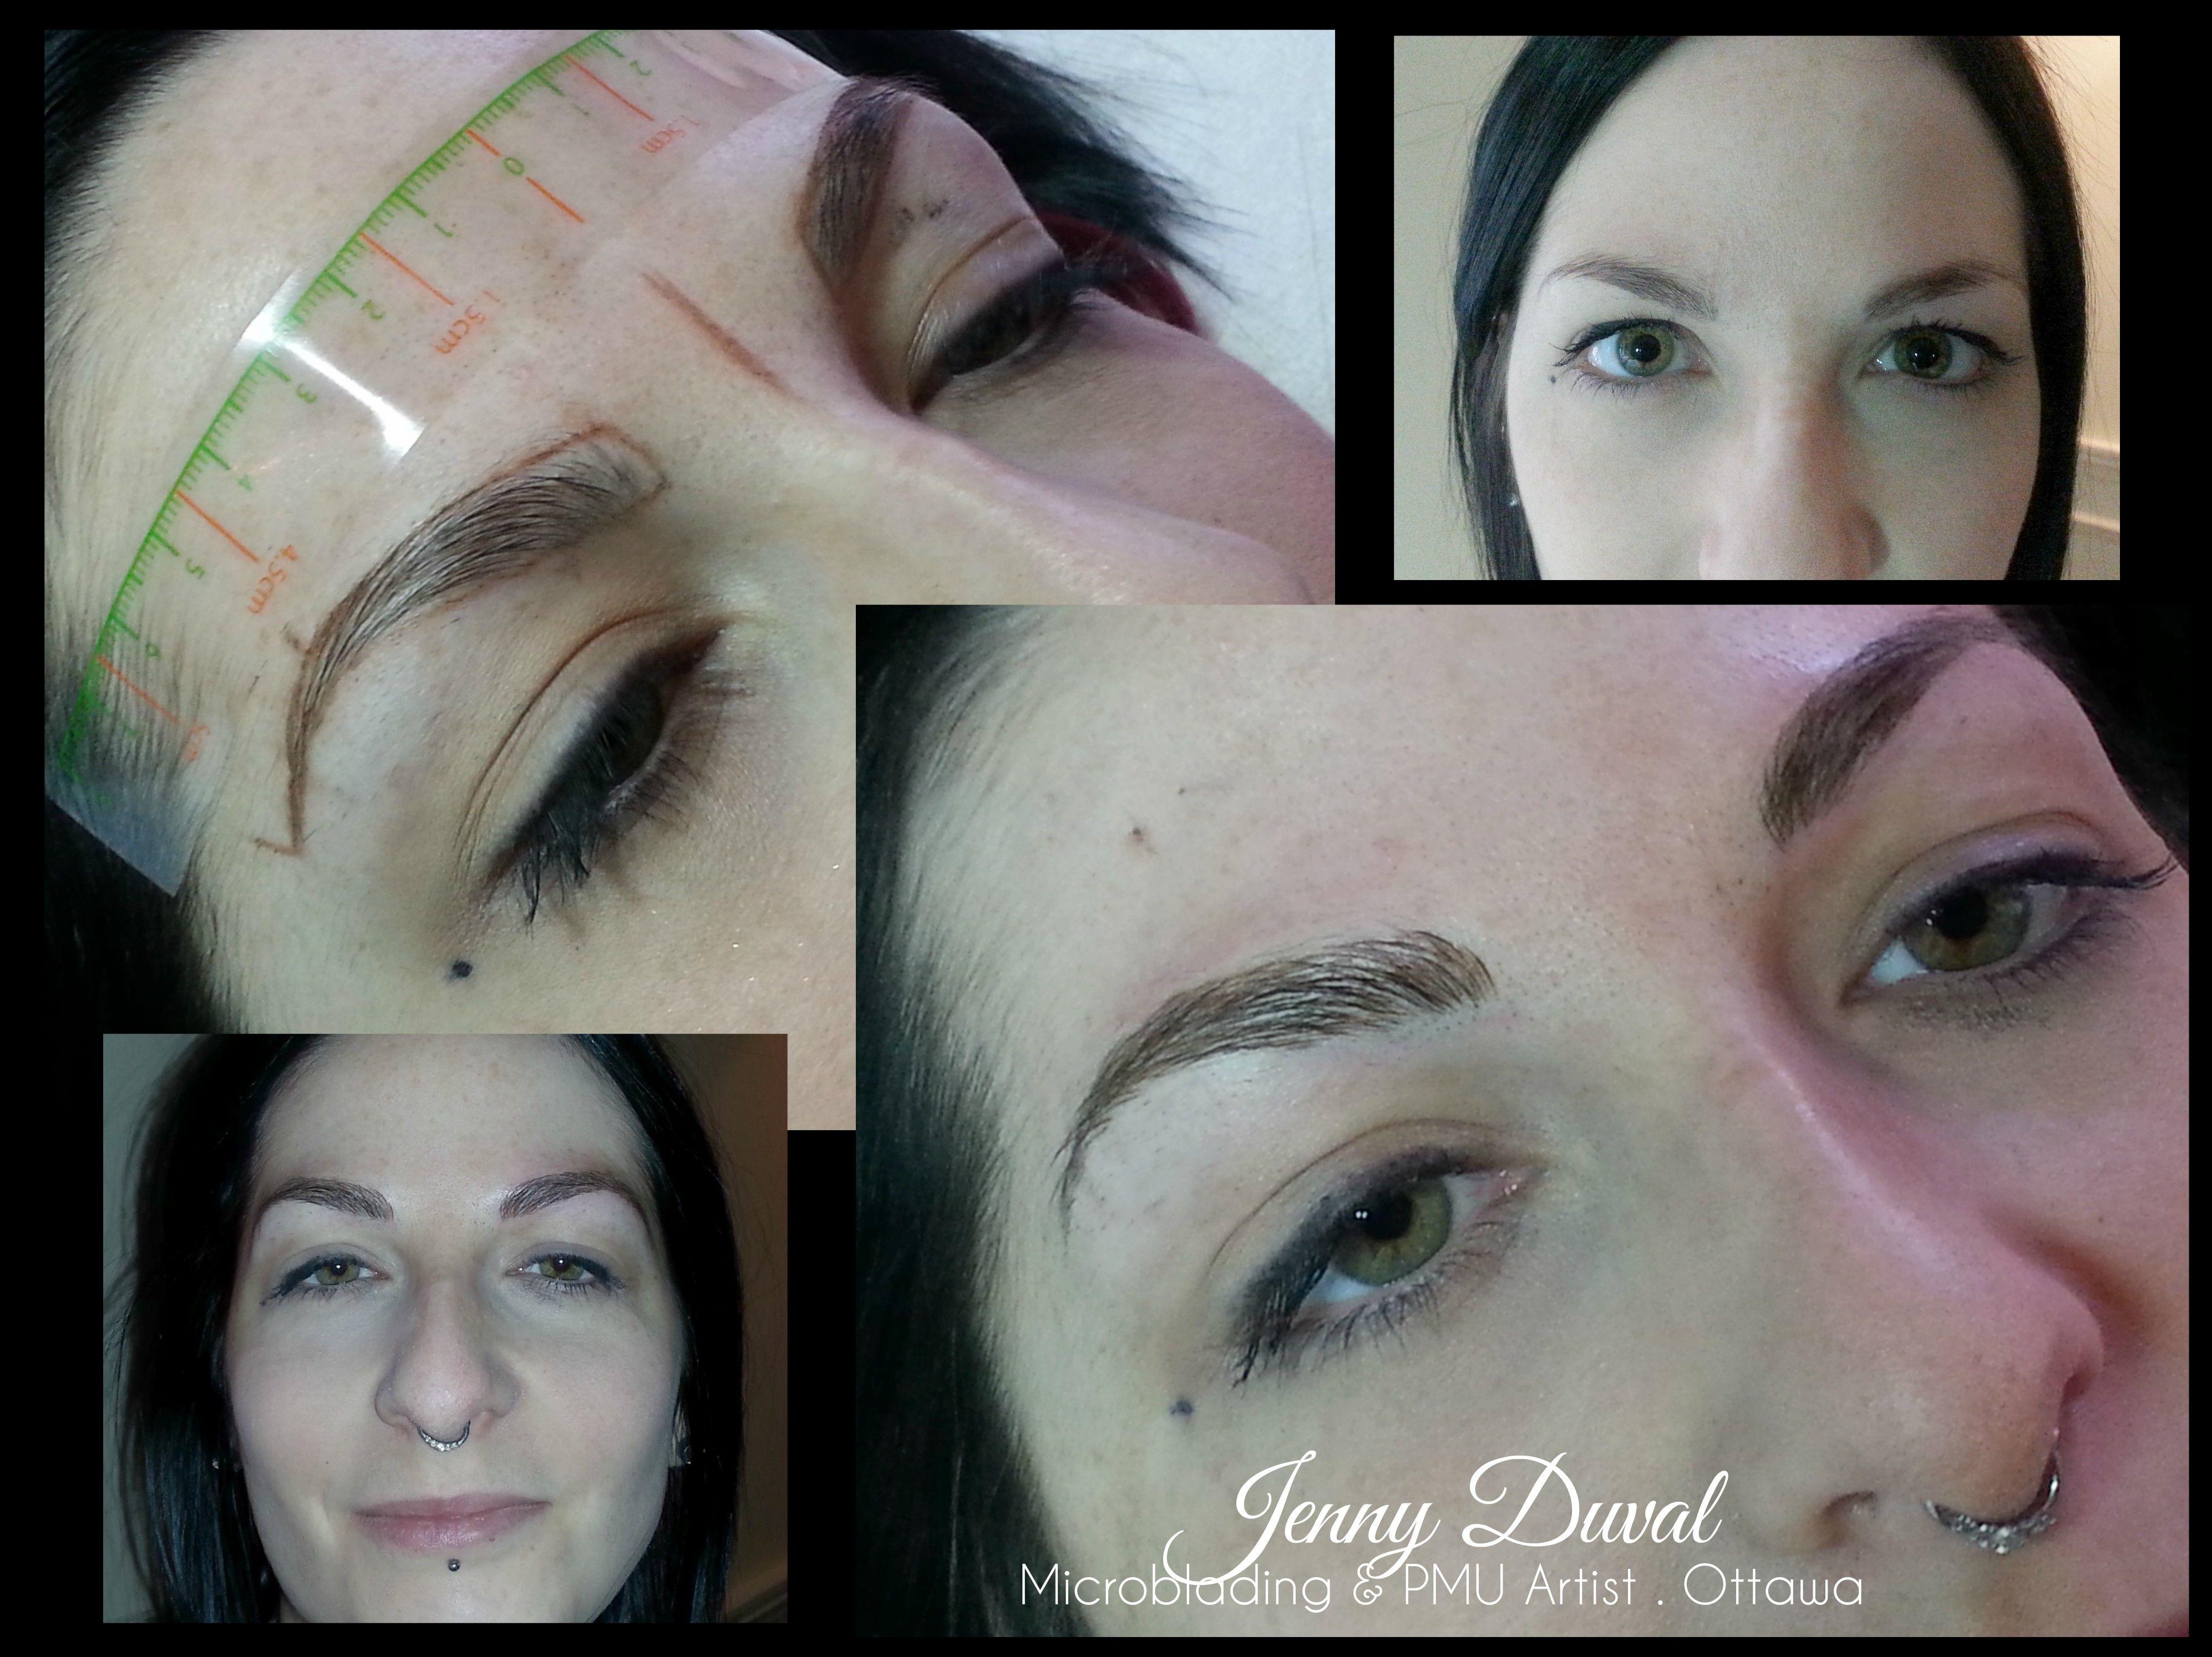 Microblading - Eyebrow Embroidery  Ottawa, Ontario - Canada Please like my Facebook page : https://www.facebook.com/Jenny-Duval-Microblading-PMU-Artist-Ottawa-921848467885712/